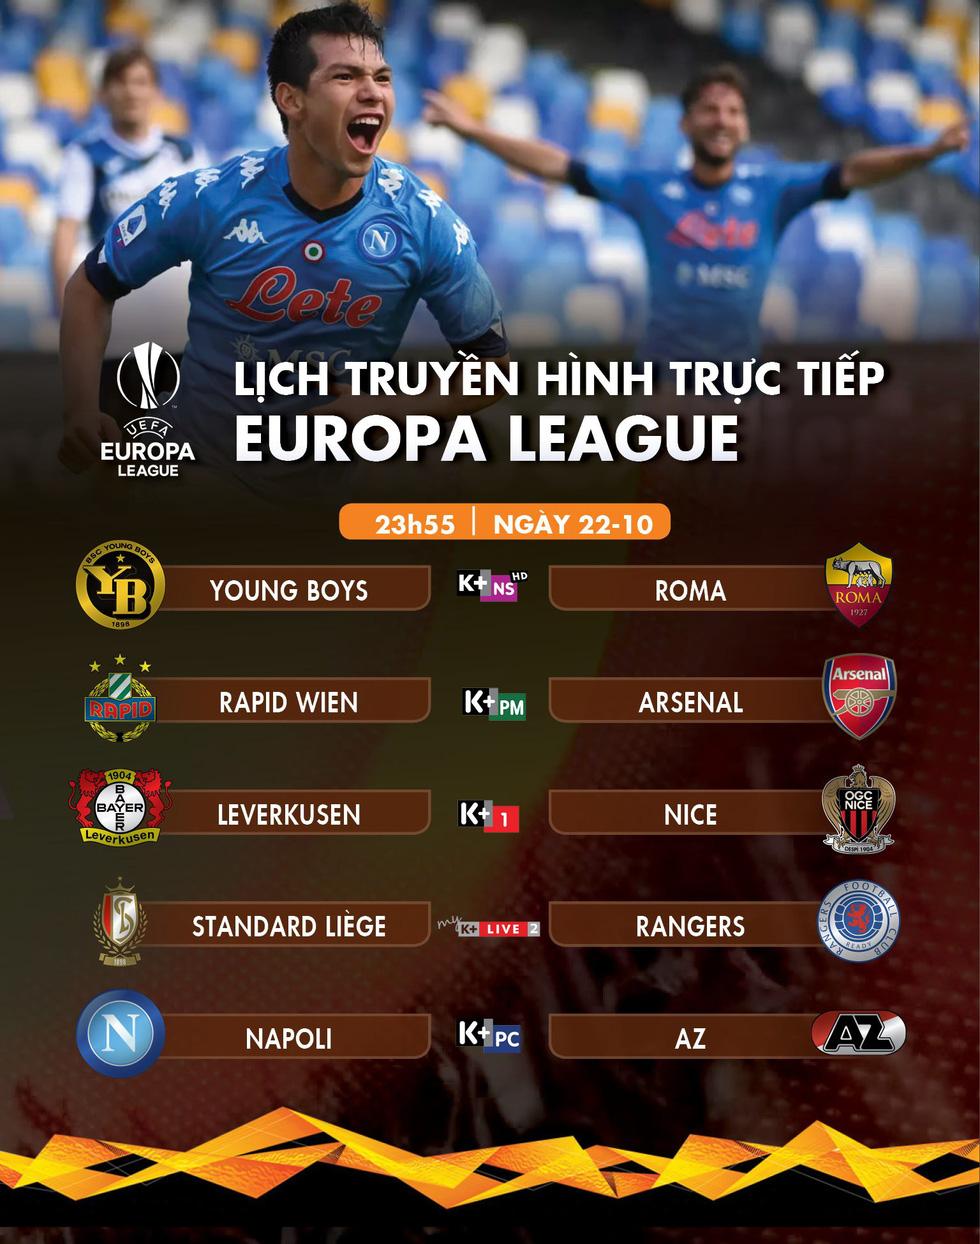 Lịch trực tiếp Europa League: Nhiều trận cầu hấp dẫn - Ảnh 1.